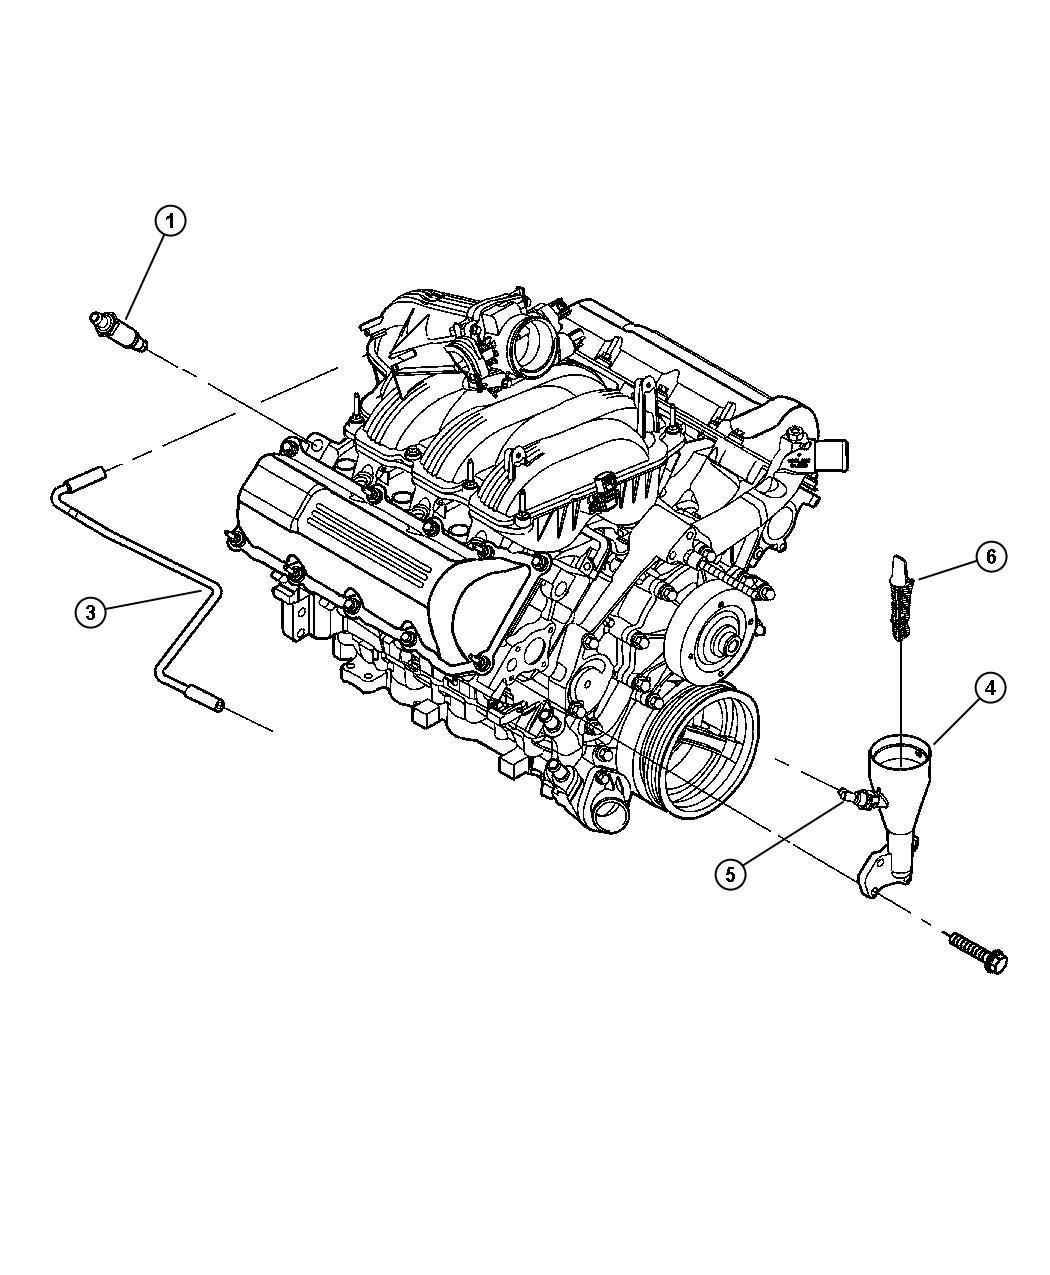 Jeep Wrangler Hose. Cylinder head to air cleaner. Ekg